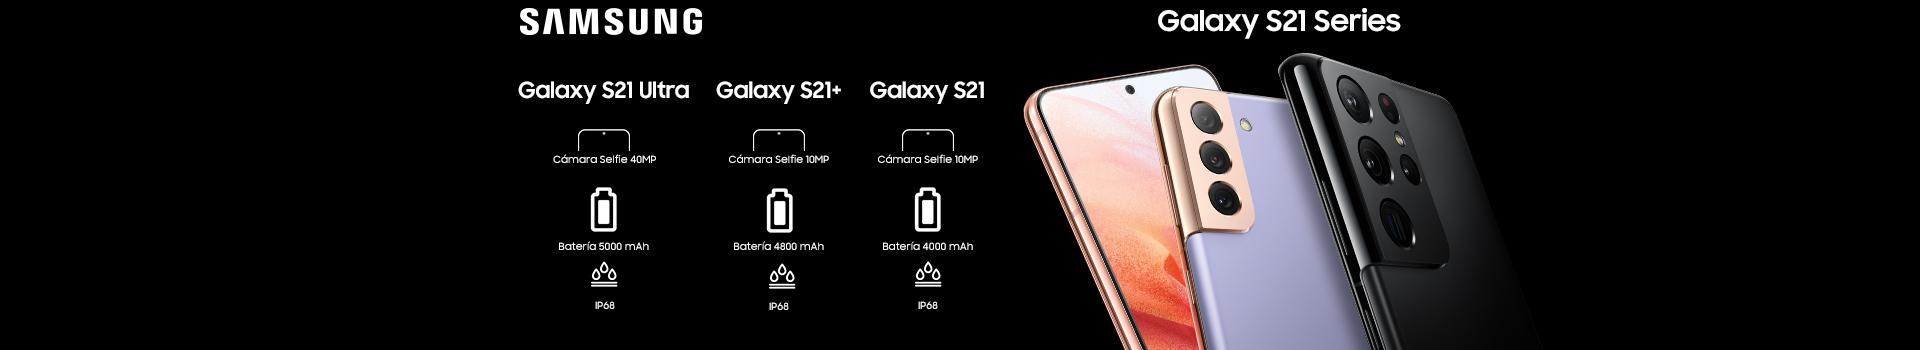 Samsung-Galaxy-Series-S21